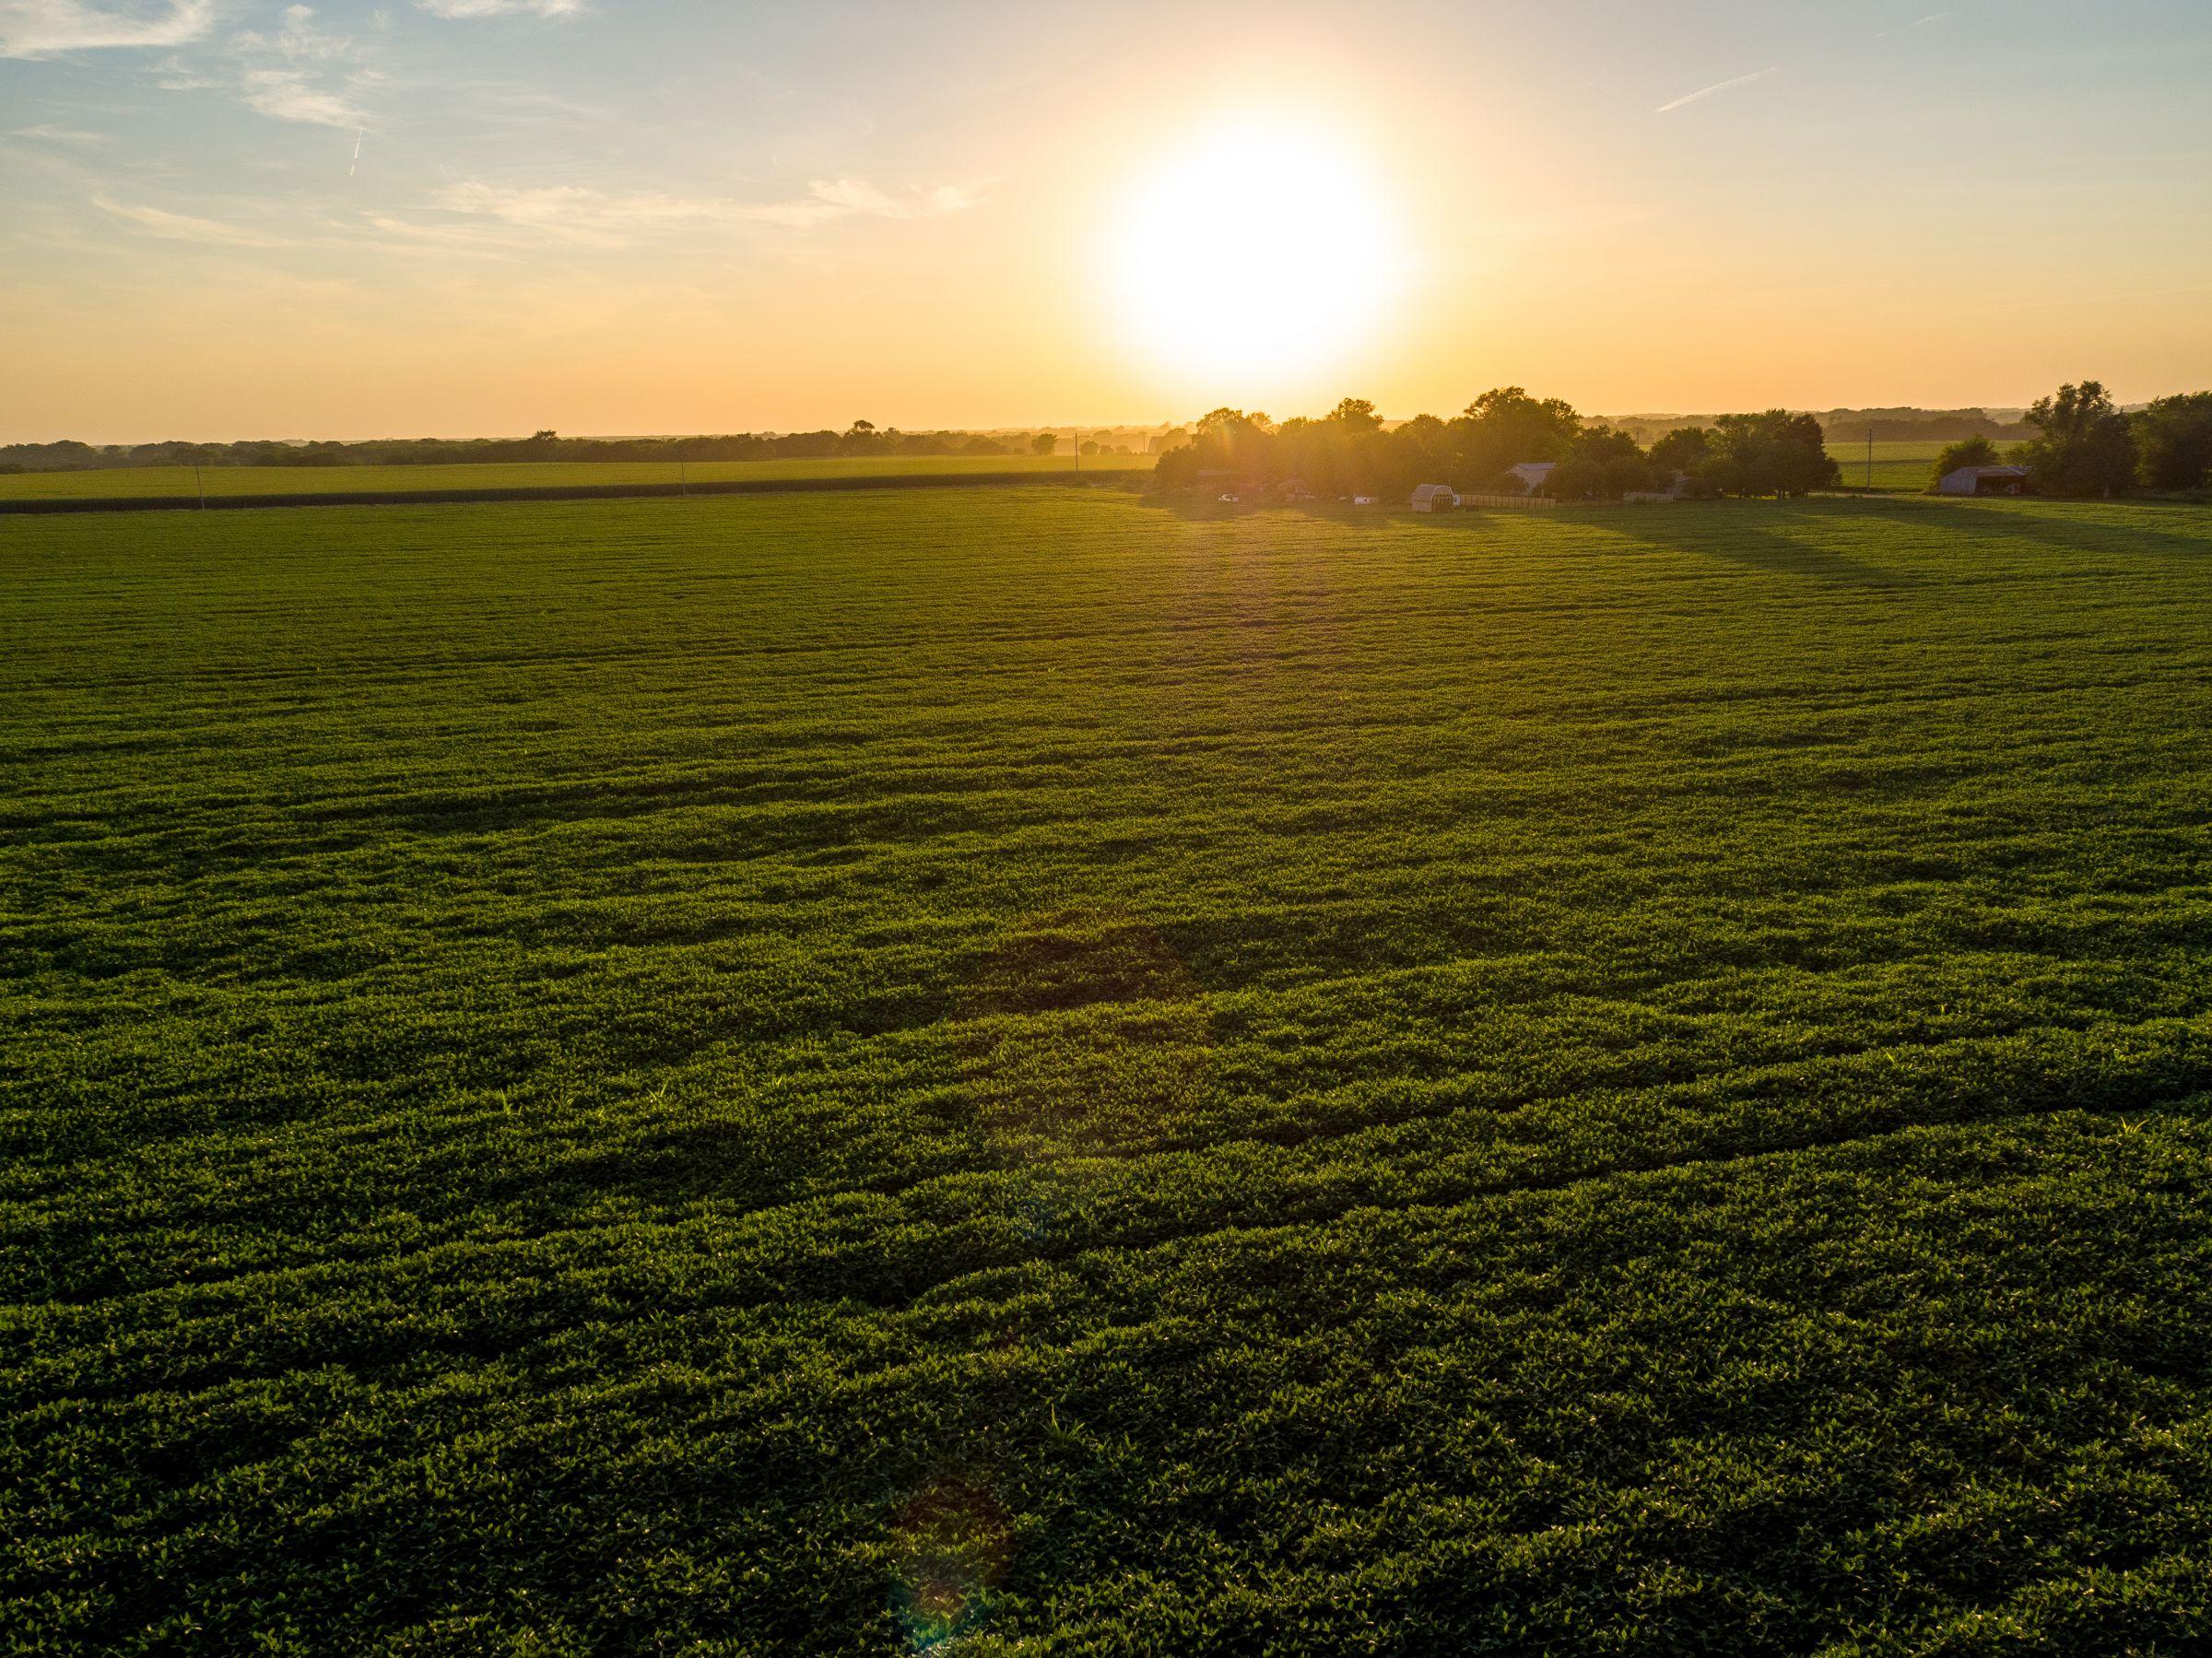 auctions-land-cass-county-nebraska-107-acres-listing-number-15713-0-2021-09-01-190823.jpeg